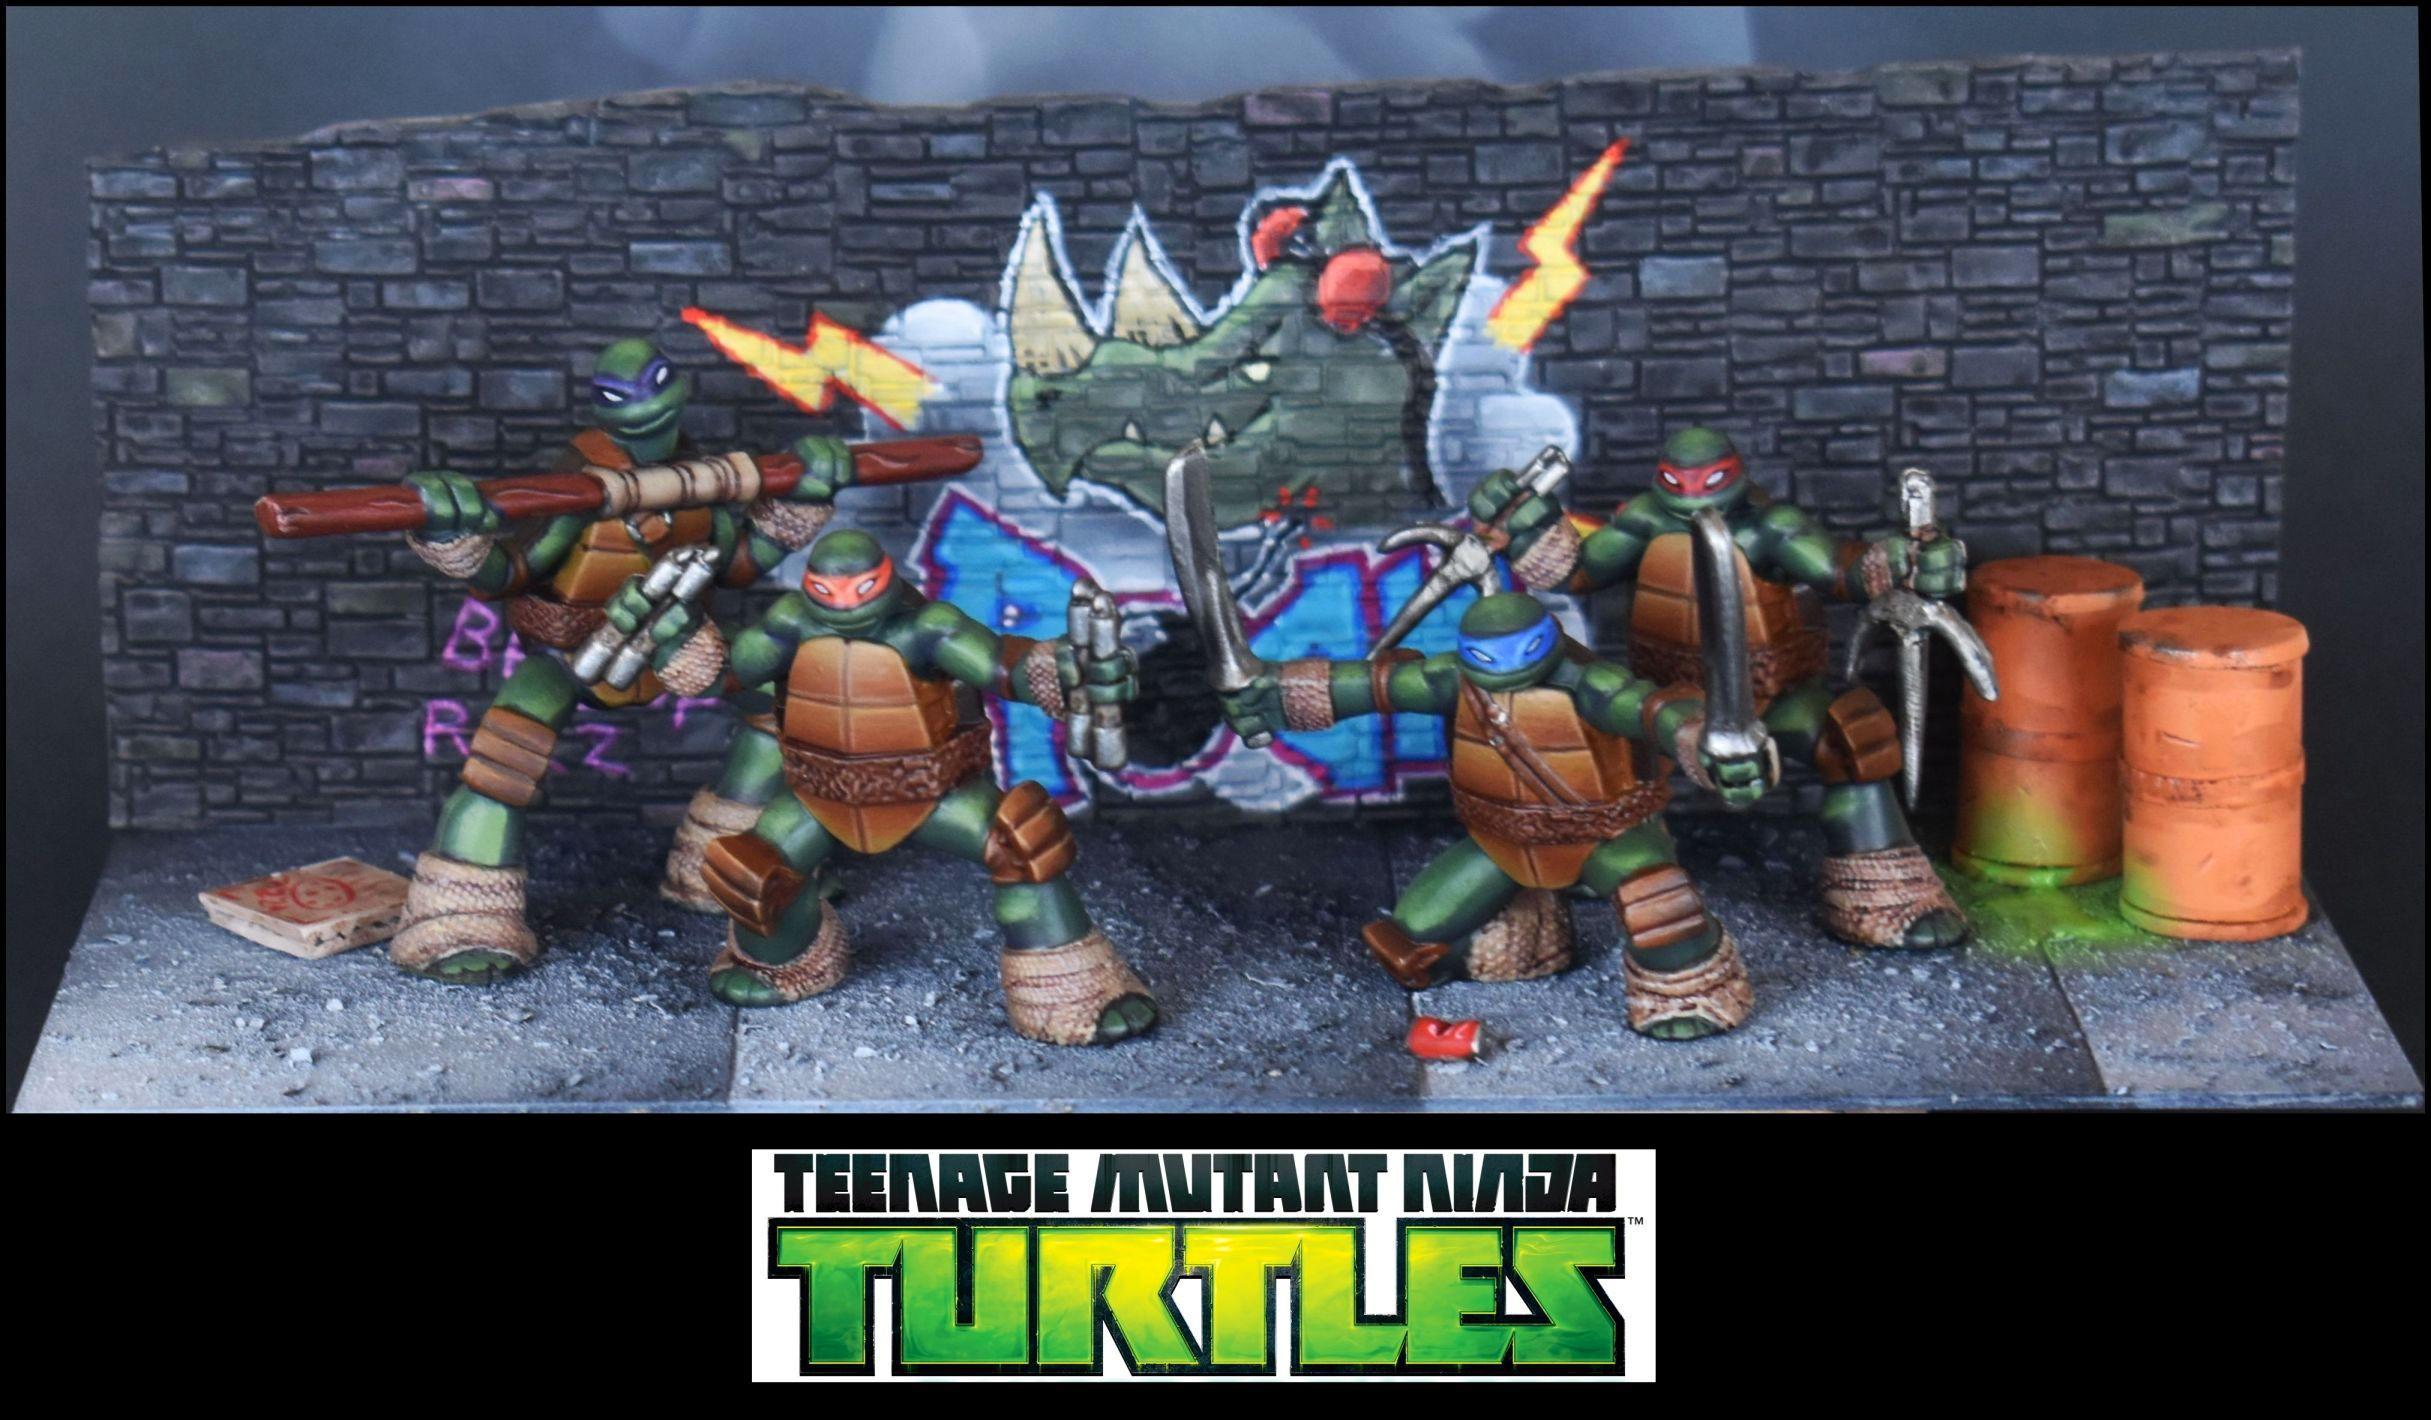 Diorama, Donatello, Leonardo, Michelangelo, Mutant, Ninjas, Raphael, Scratch Build, Set, Teenage, Tmnt, Turtles